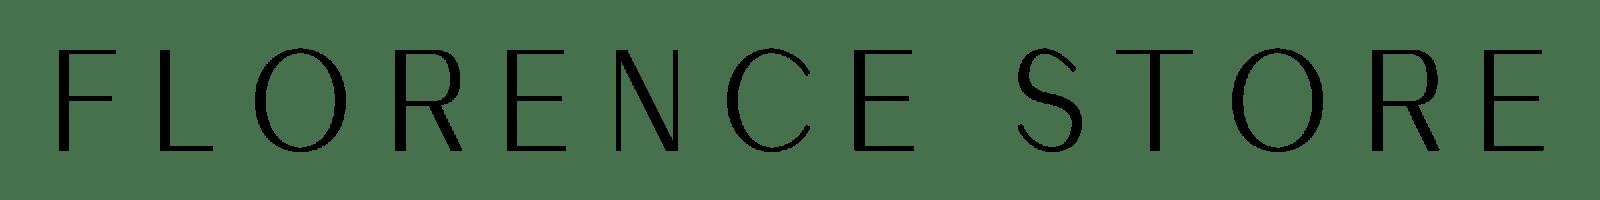 Florence Store Logo